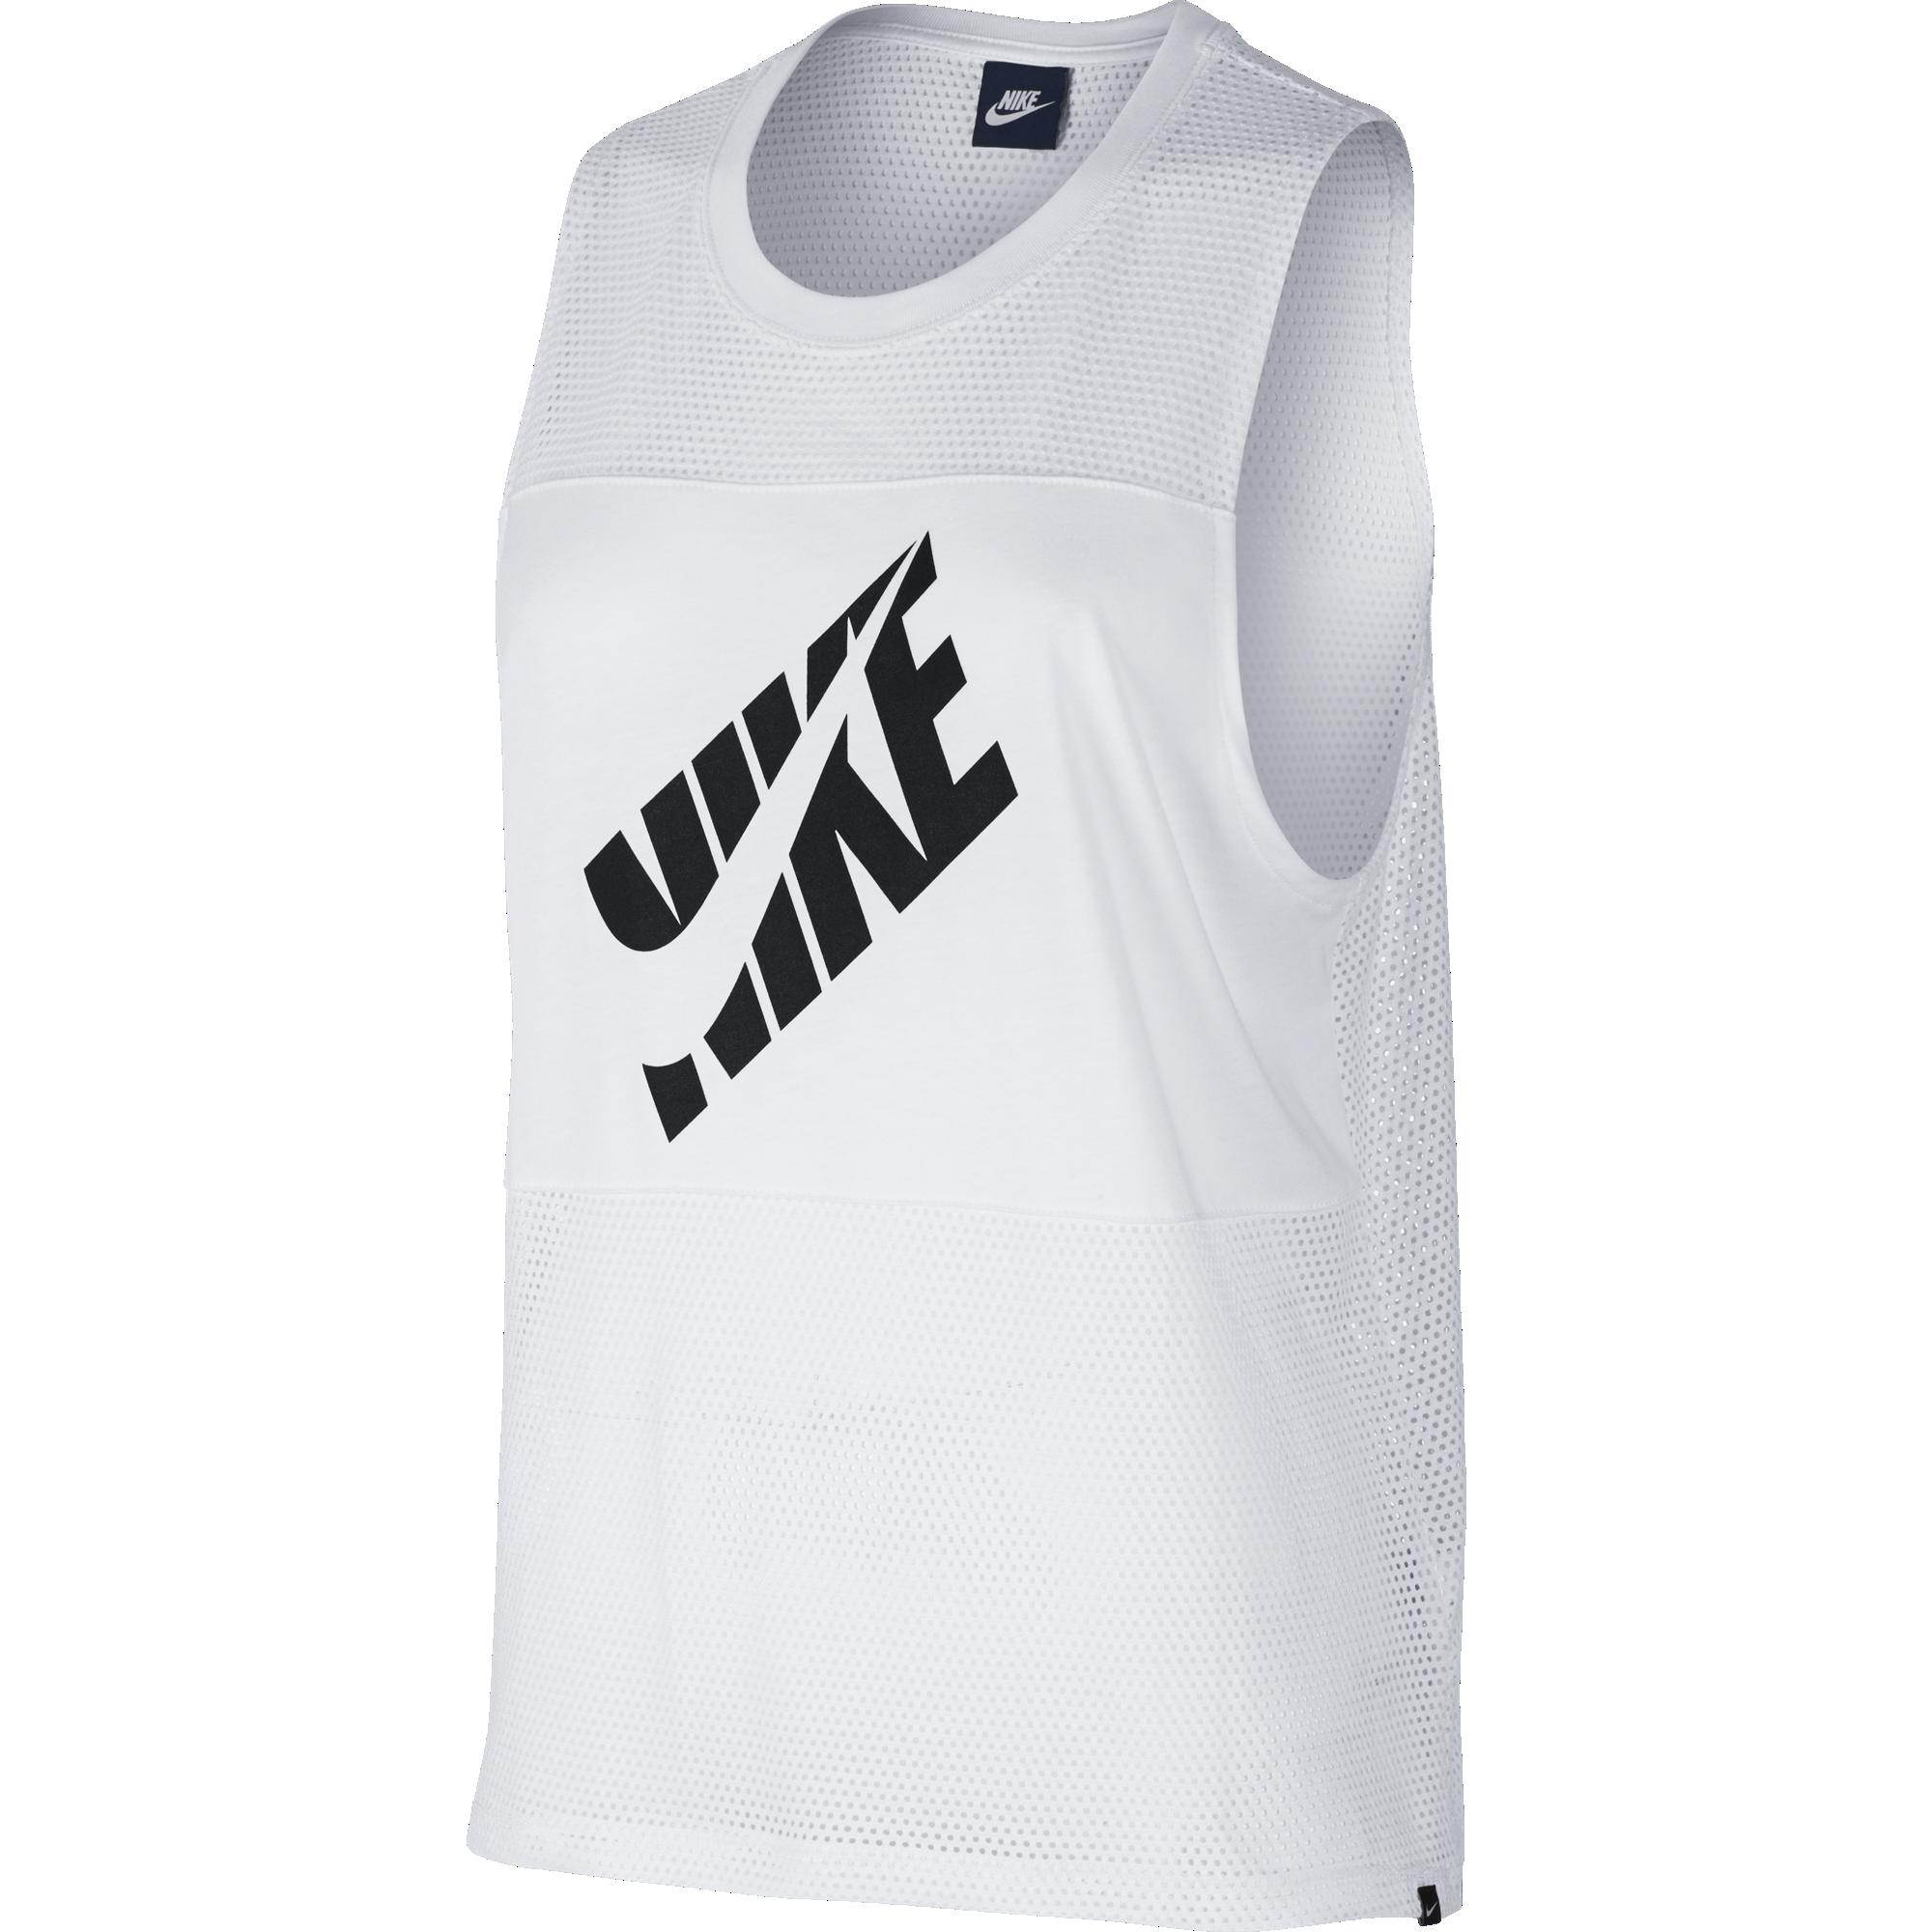 a84ca6b7ae Nike Prep 2 Mesh 725826-100 Női Atléta | Atléta